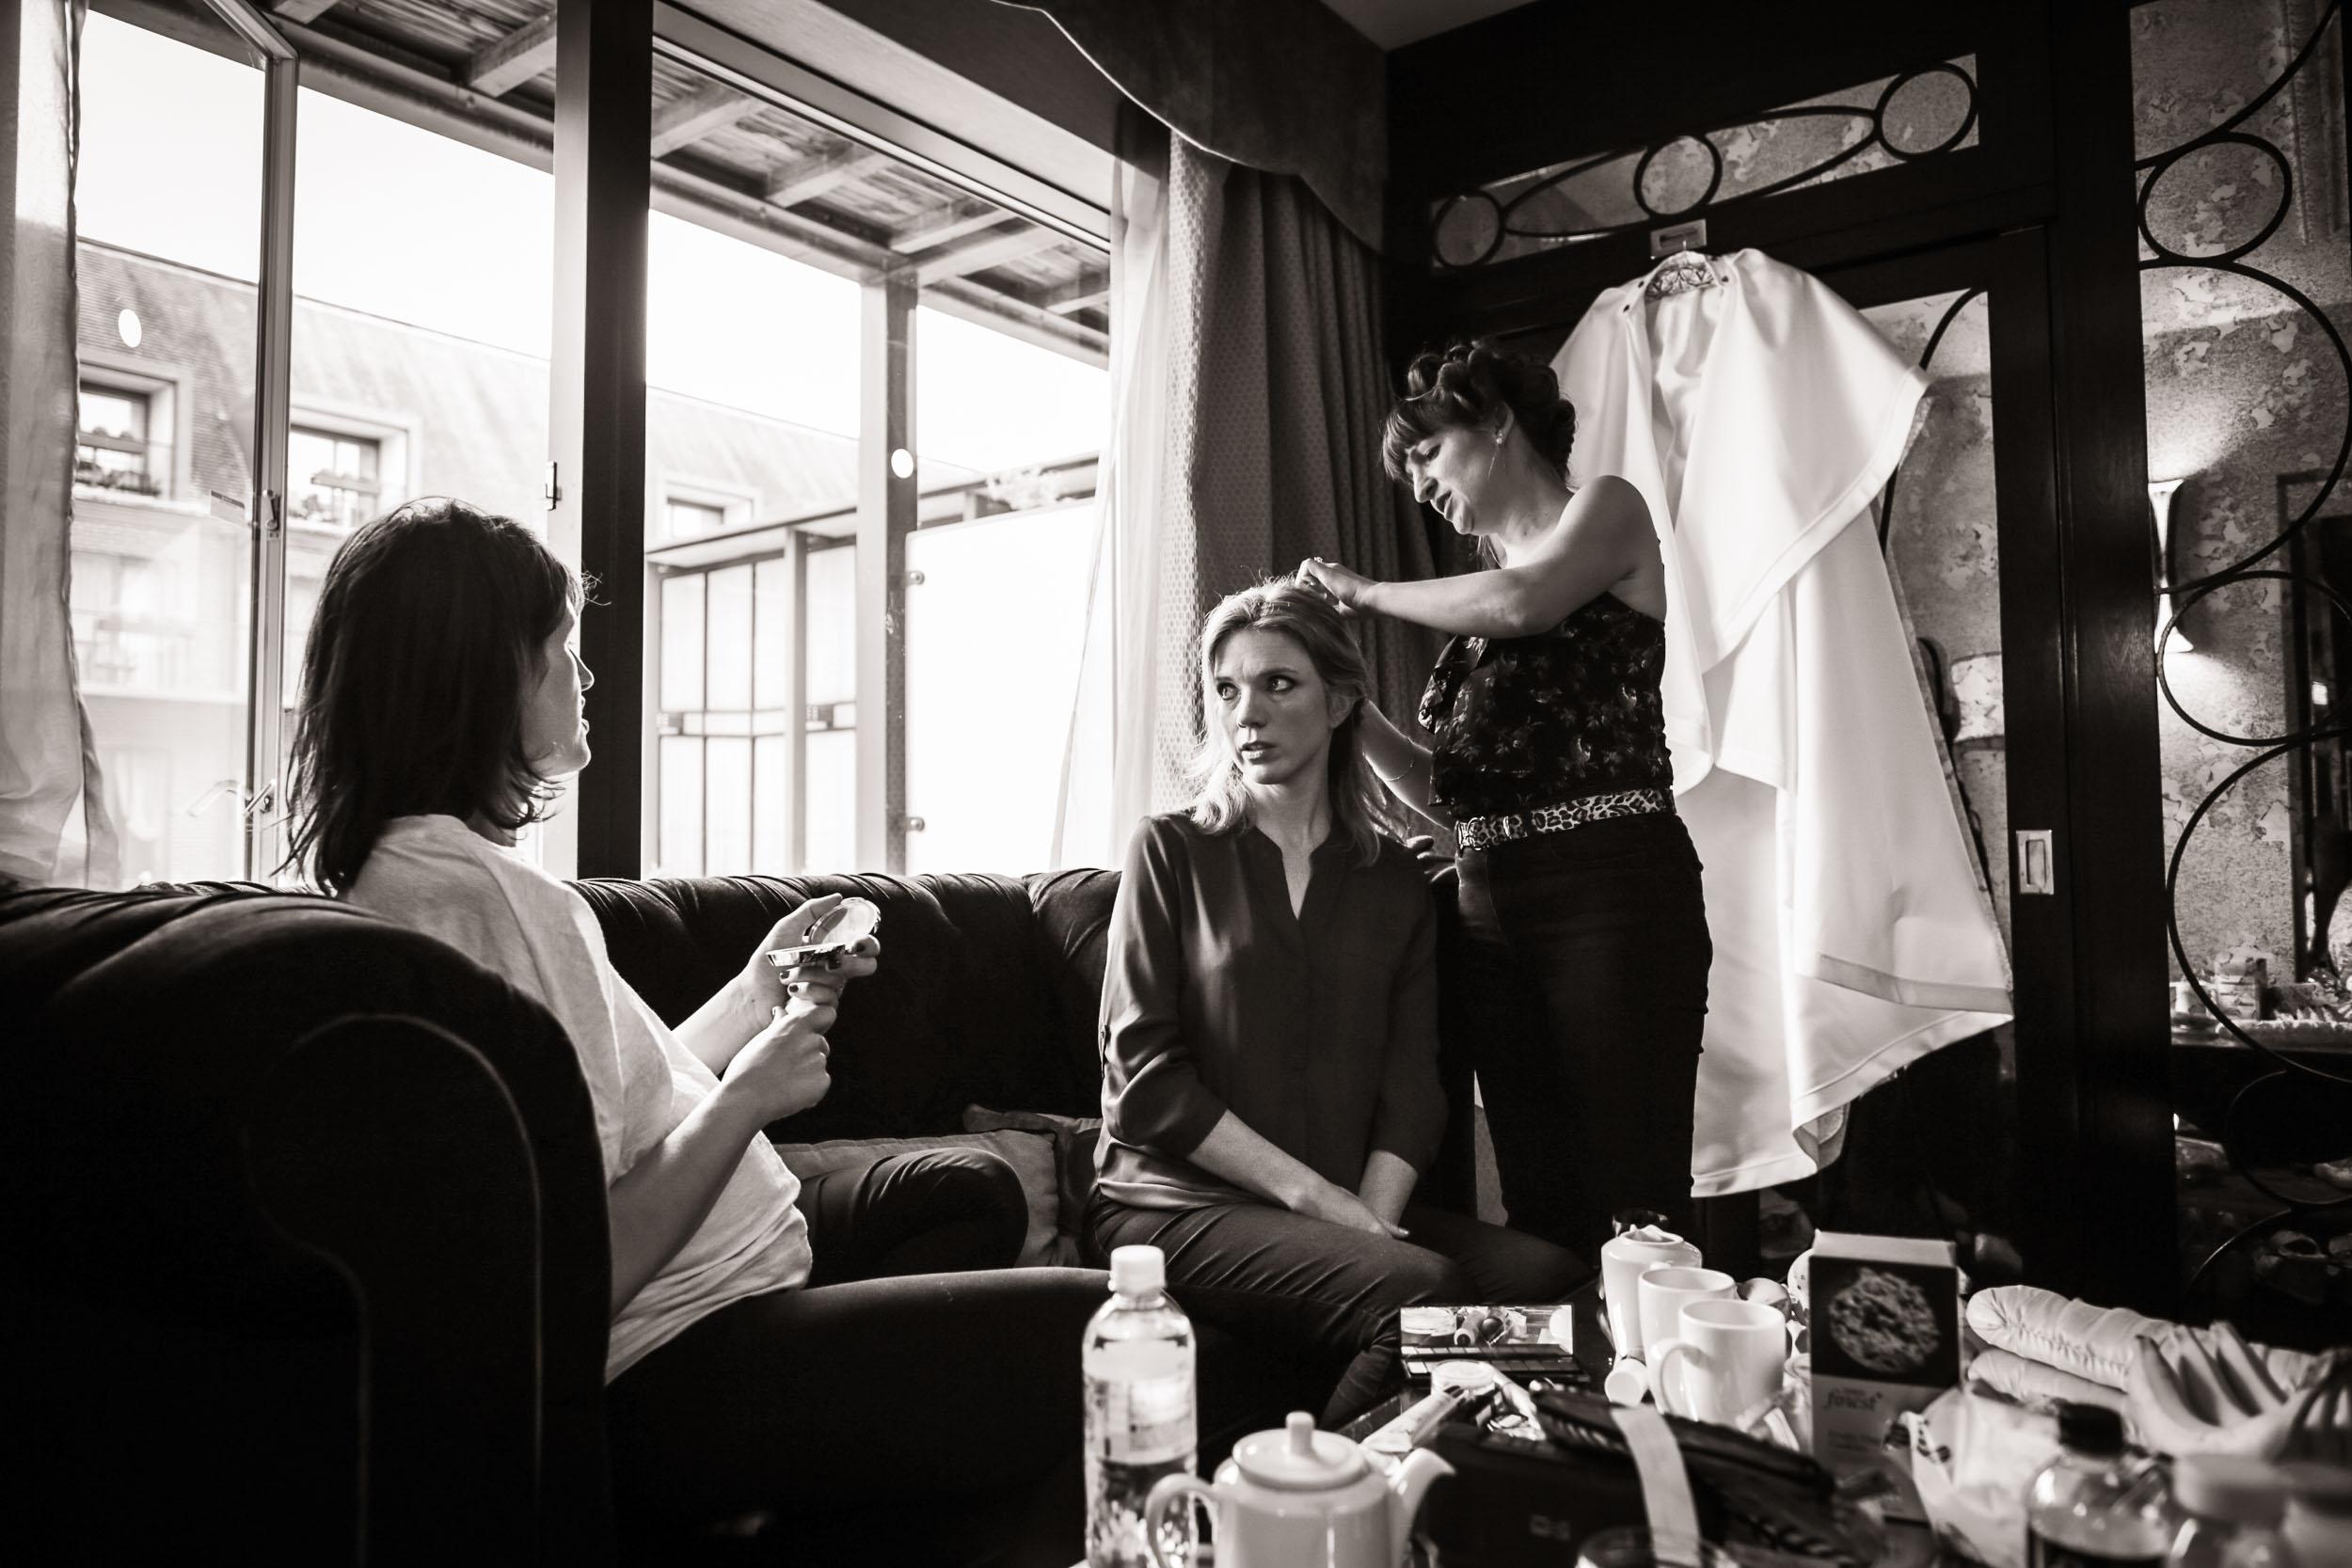 syon-house-wedding-photographer-london 006.jpg